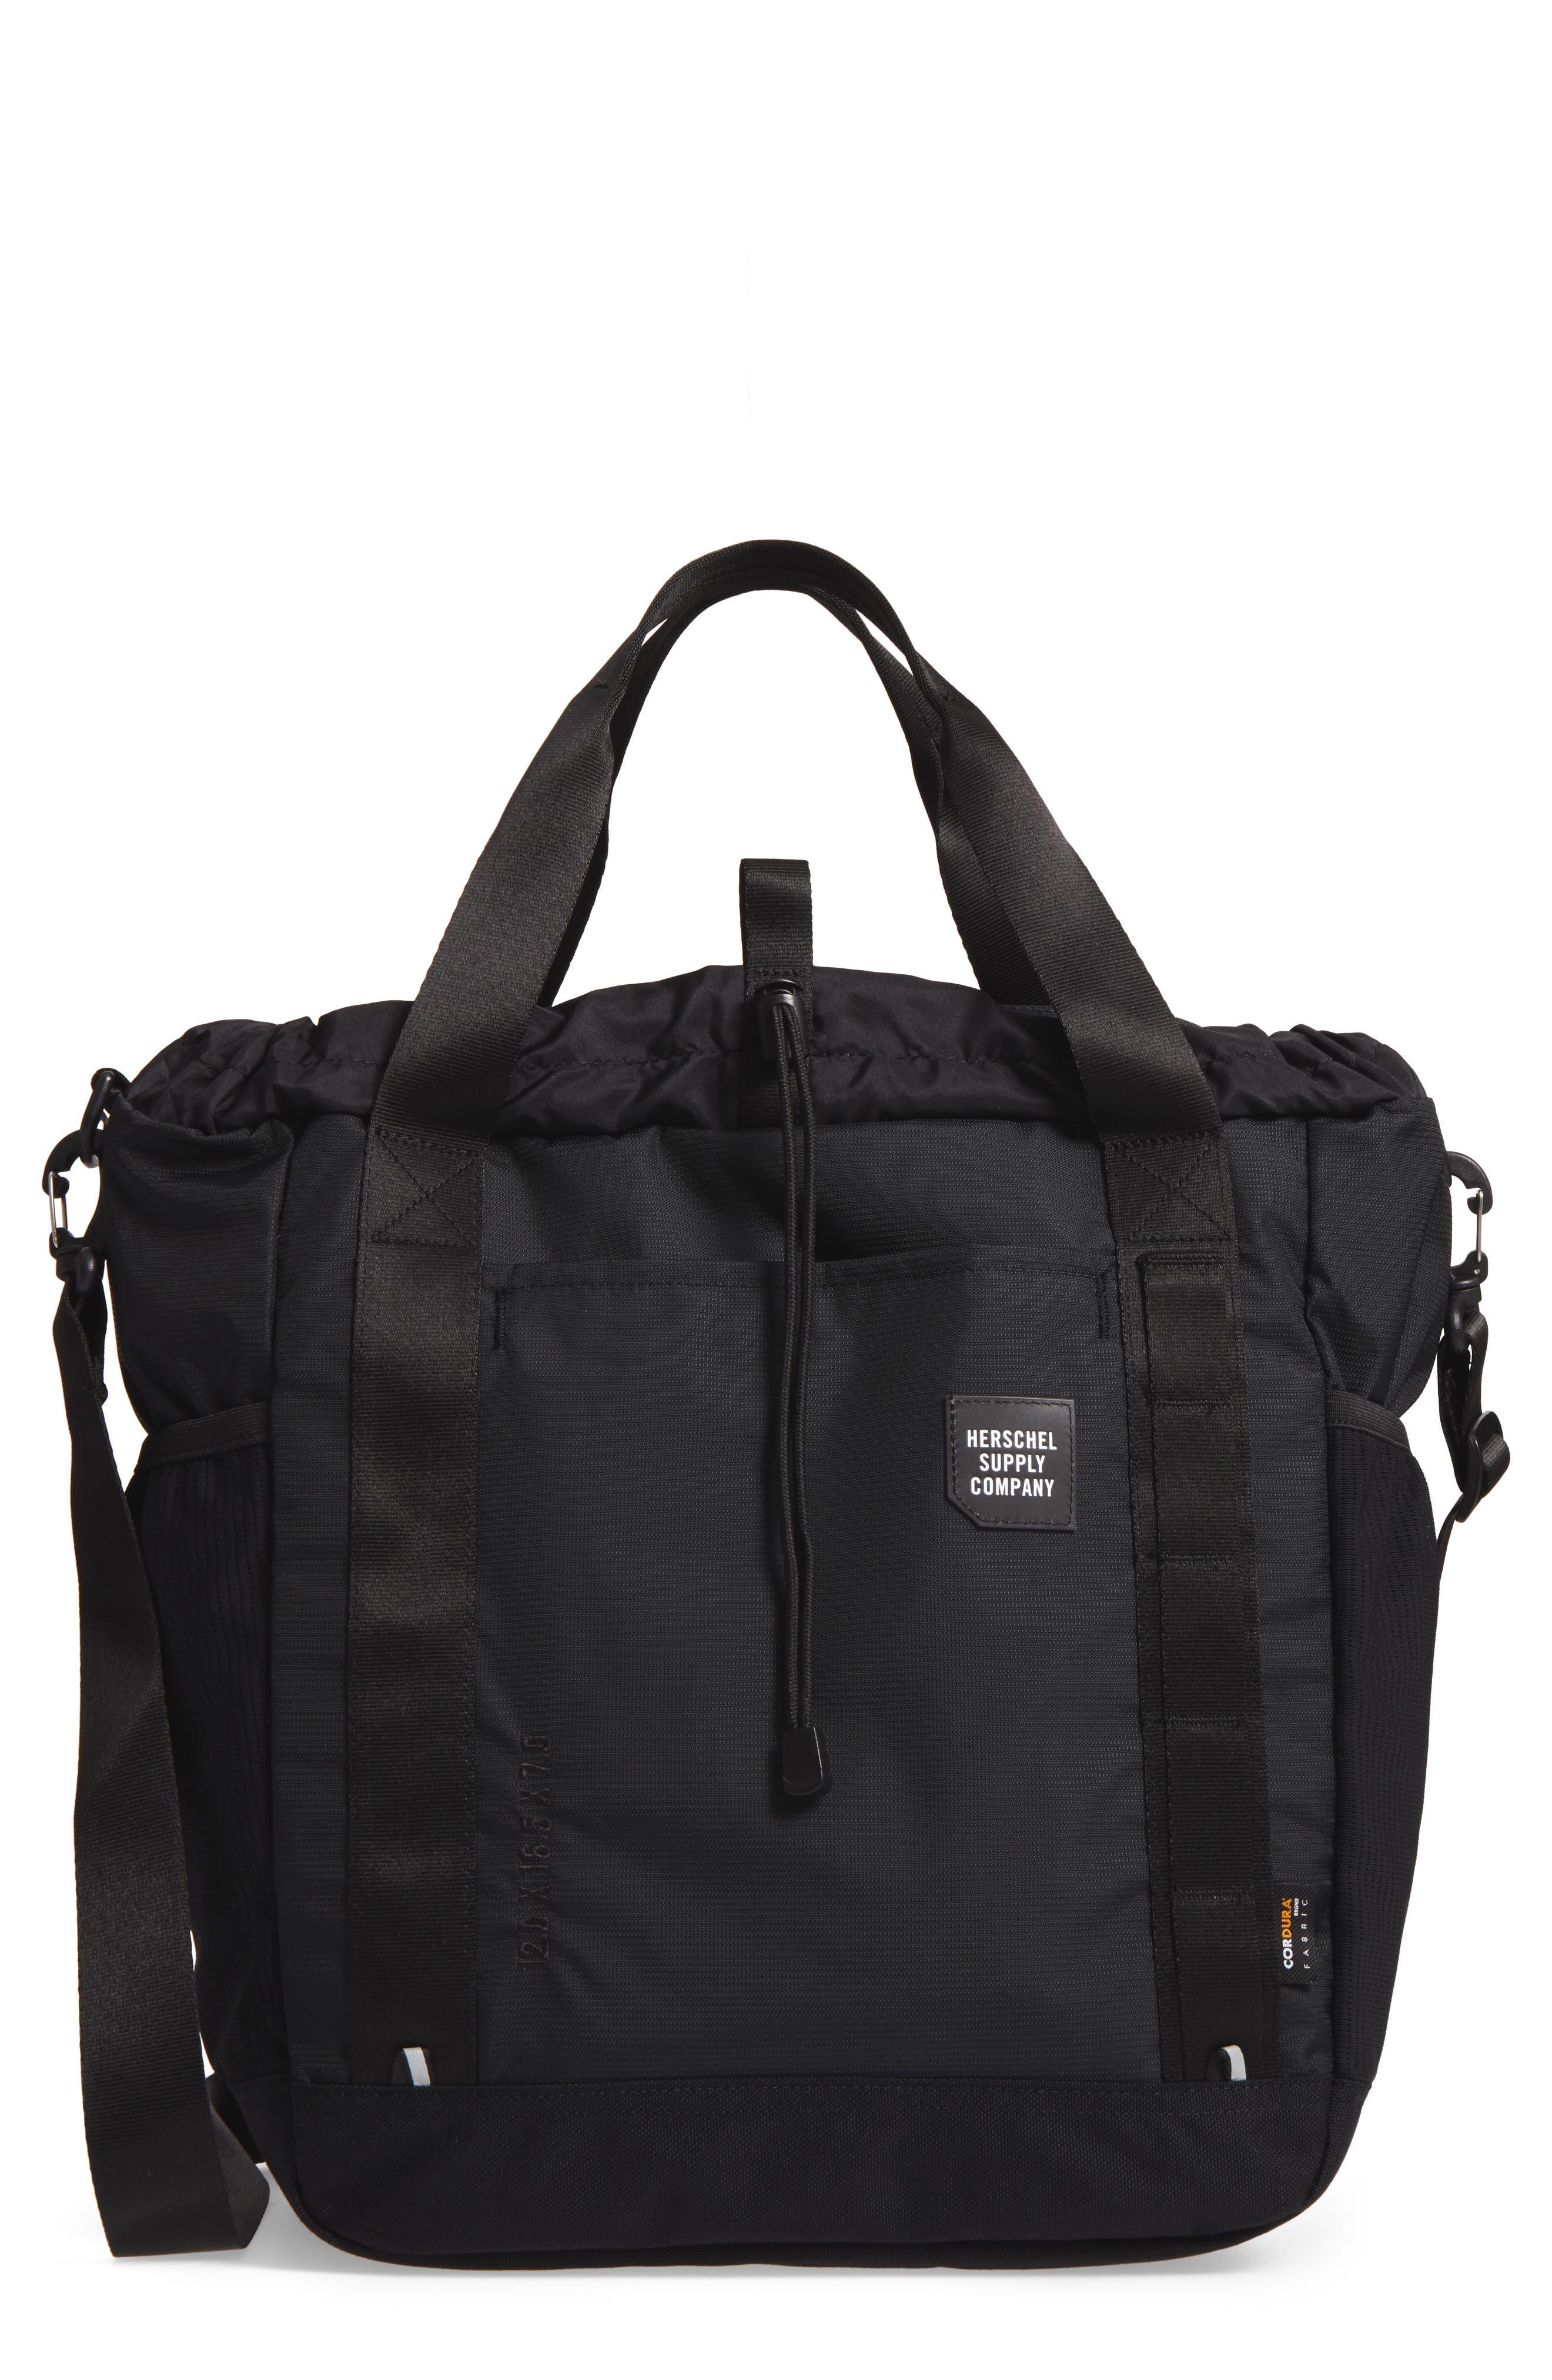 Barnes Trail Tote Bag,                         Main,                         color, BLACK